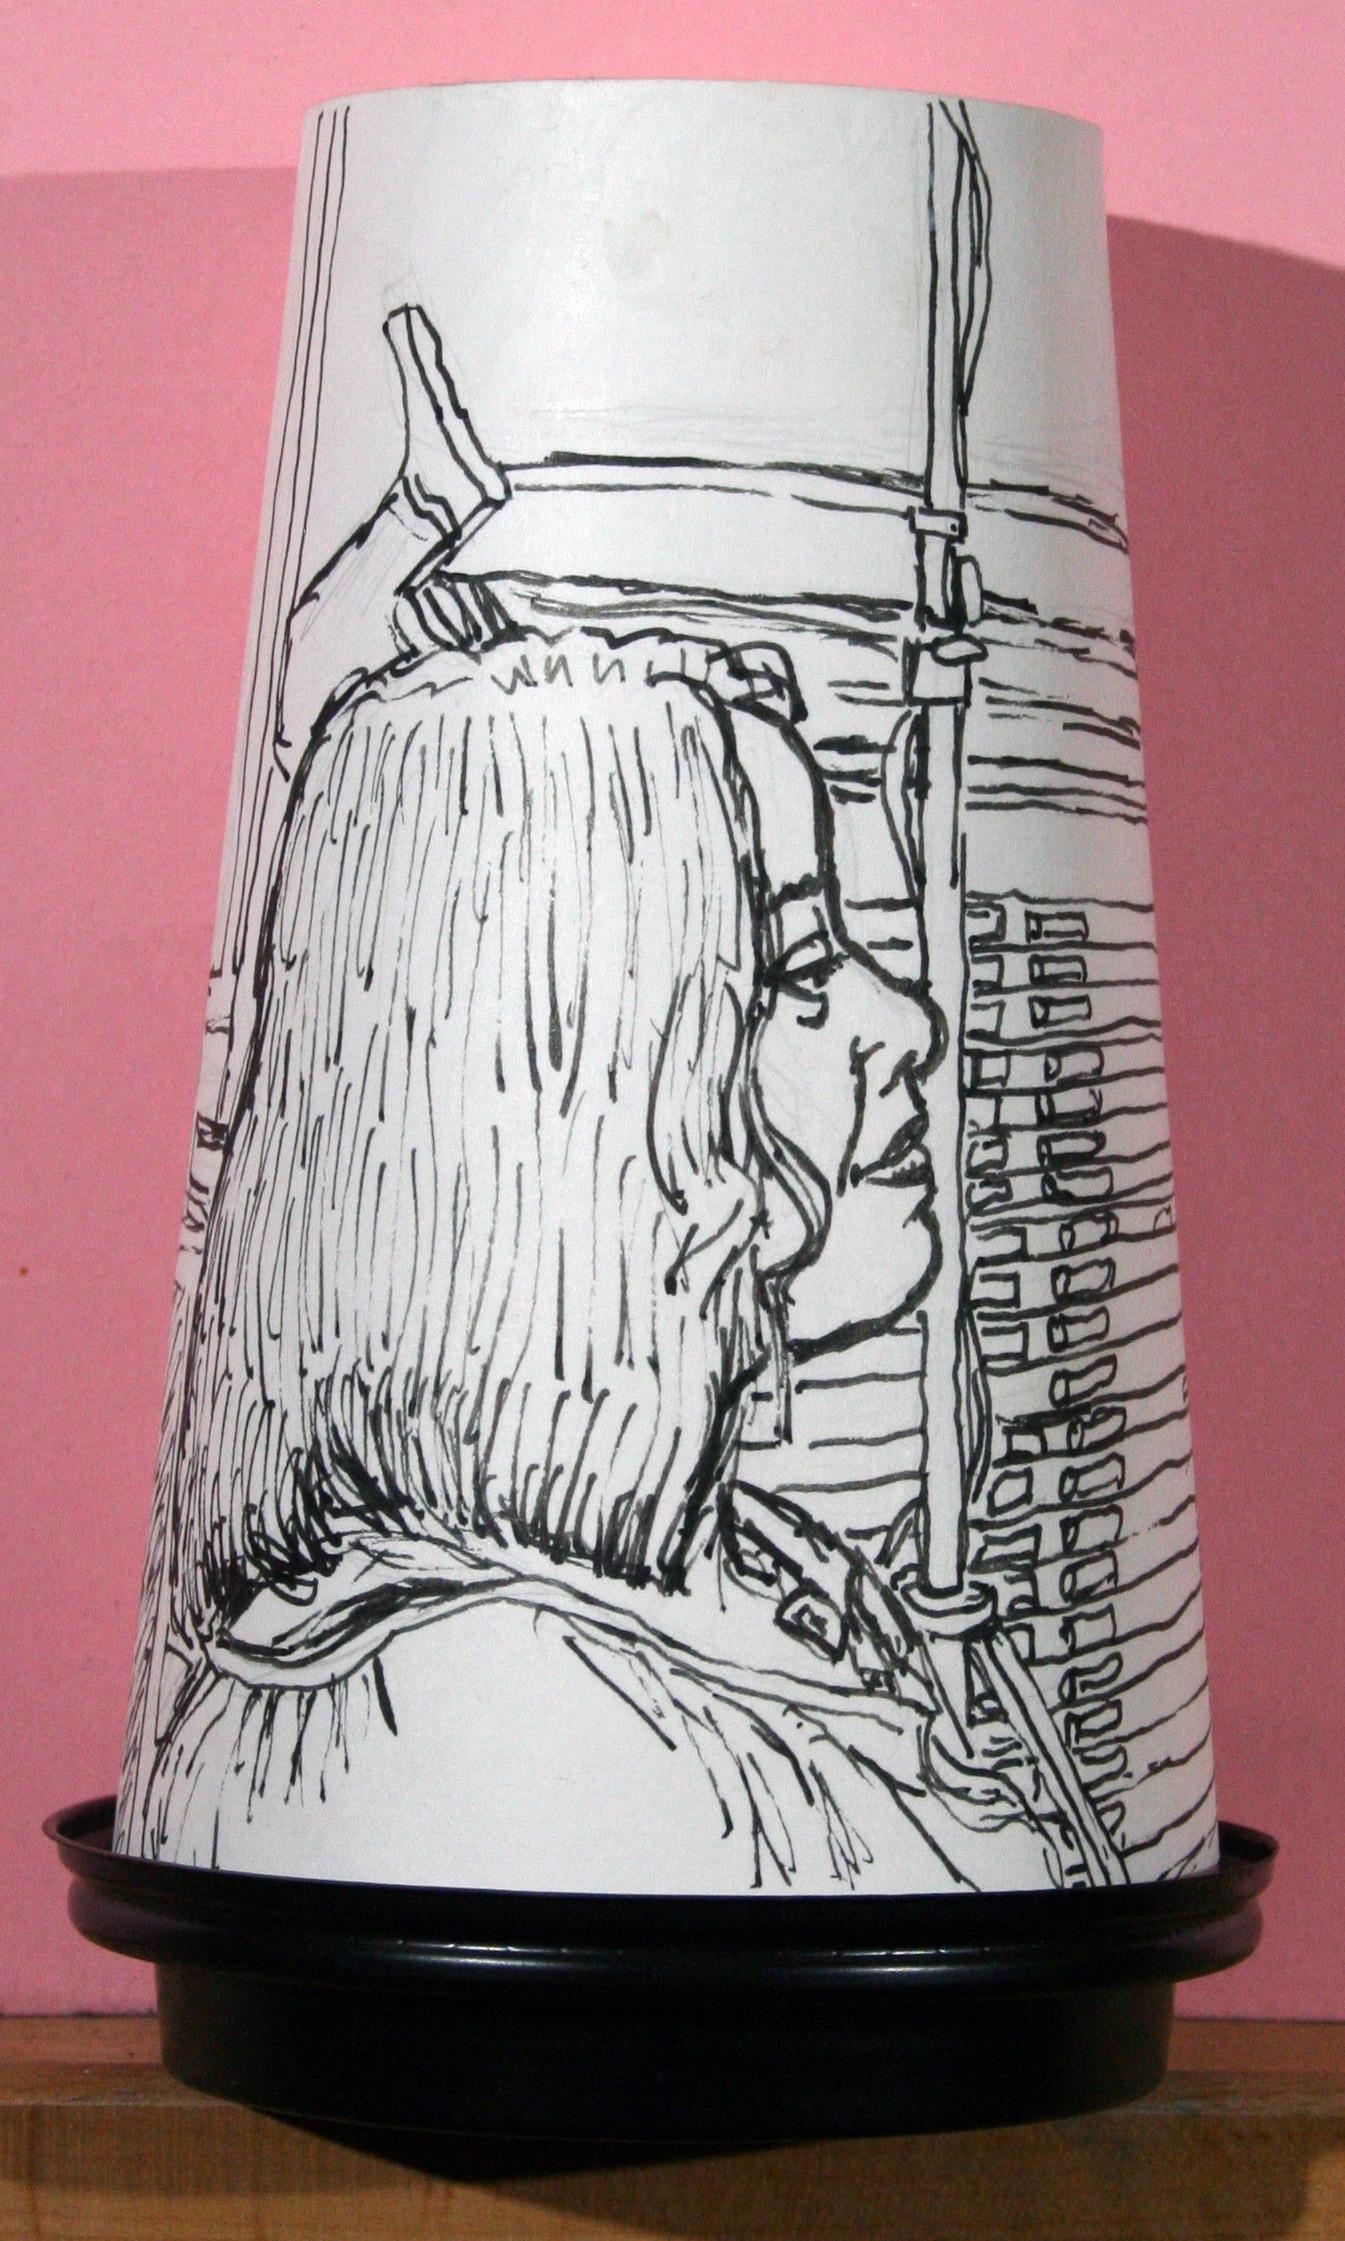 Jack Flotte's coffee cup portrait - ink